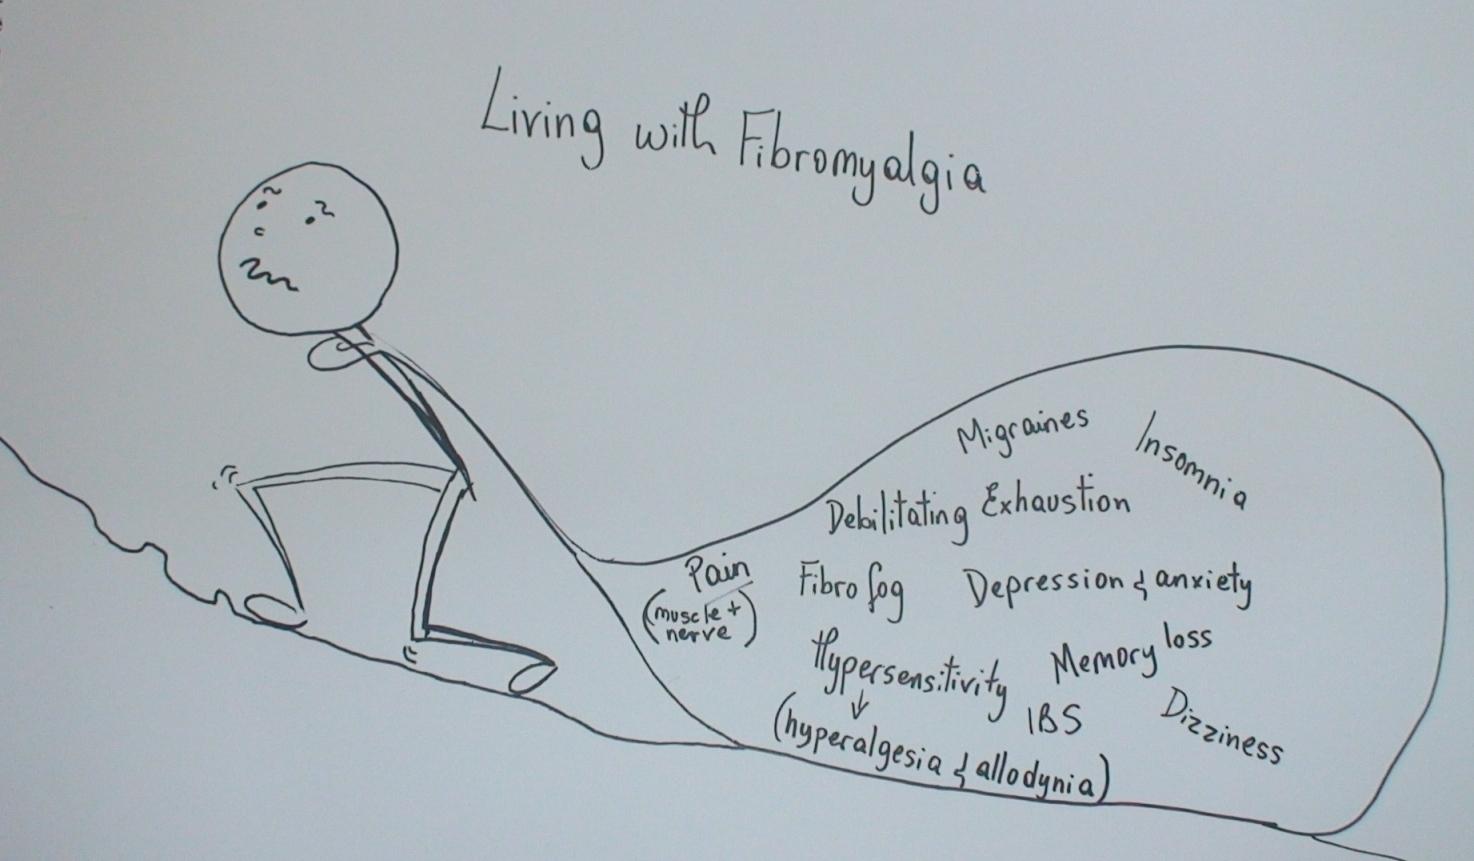 Bang, bang…Fibromyalgia Kills